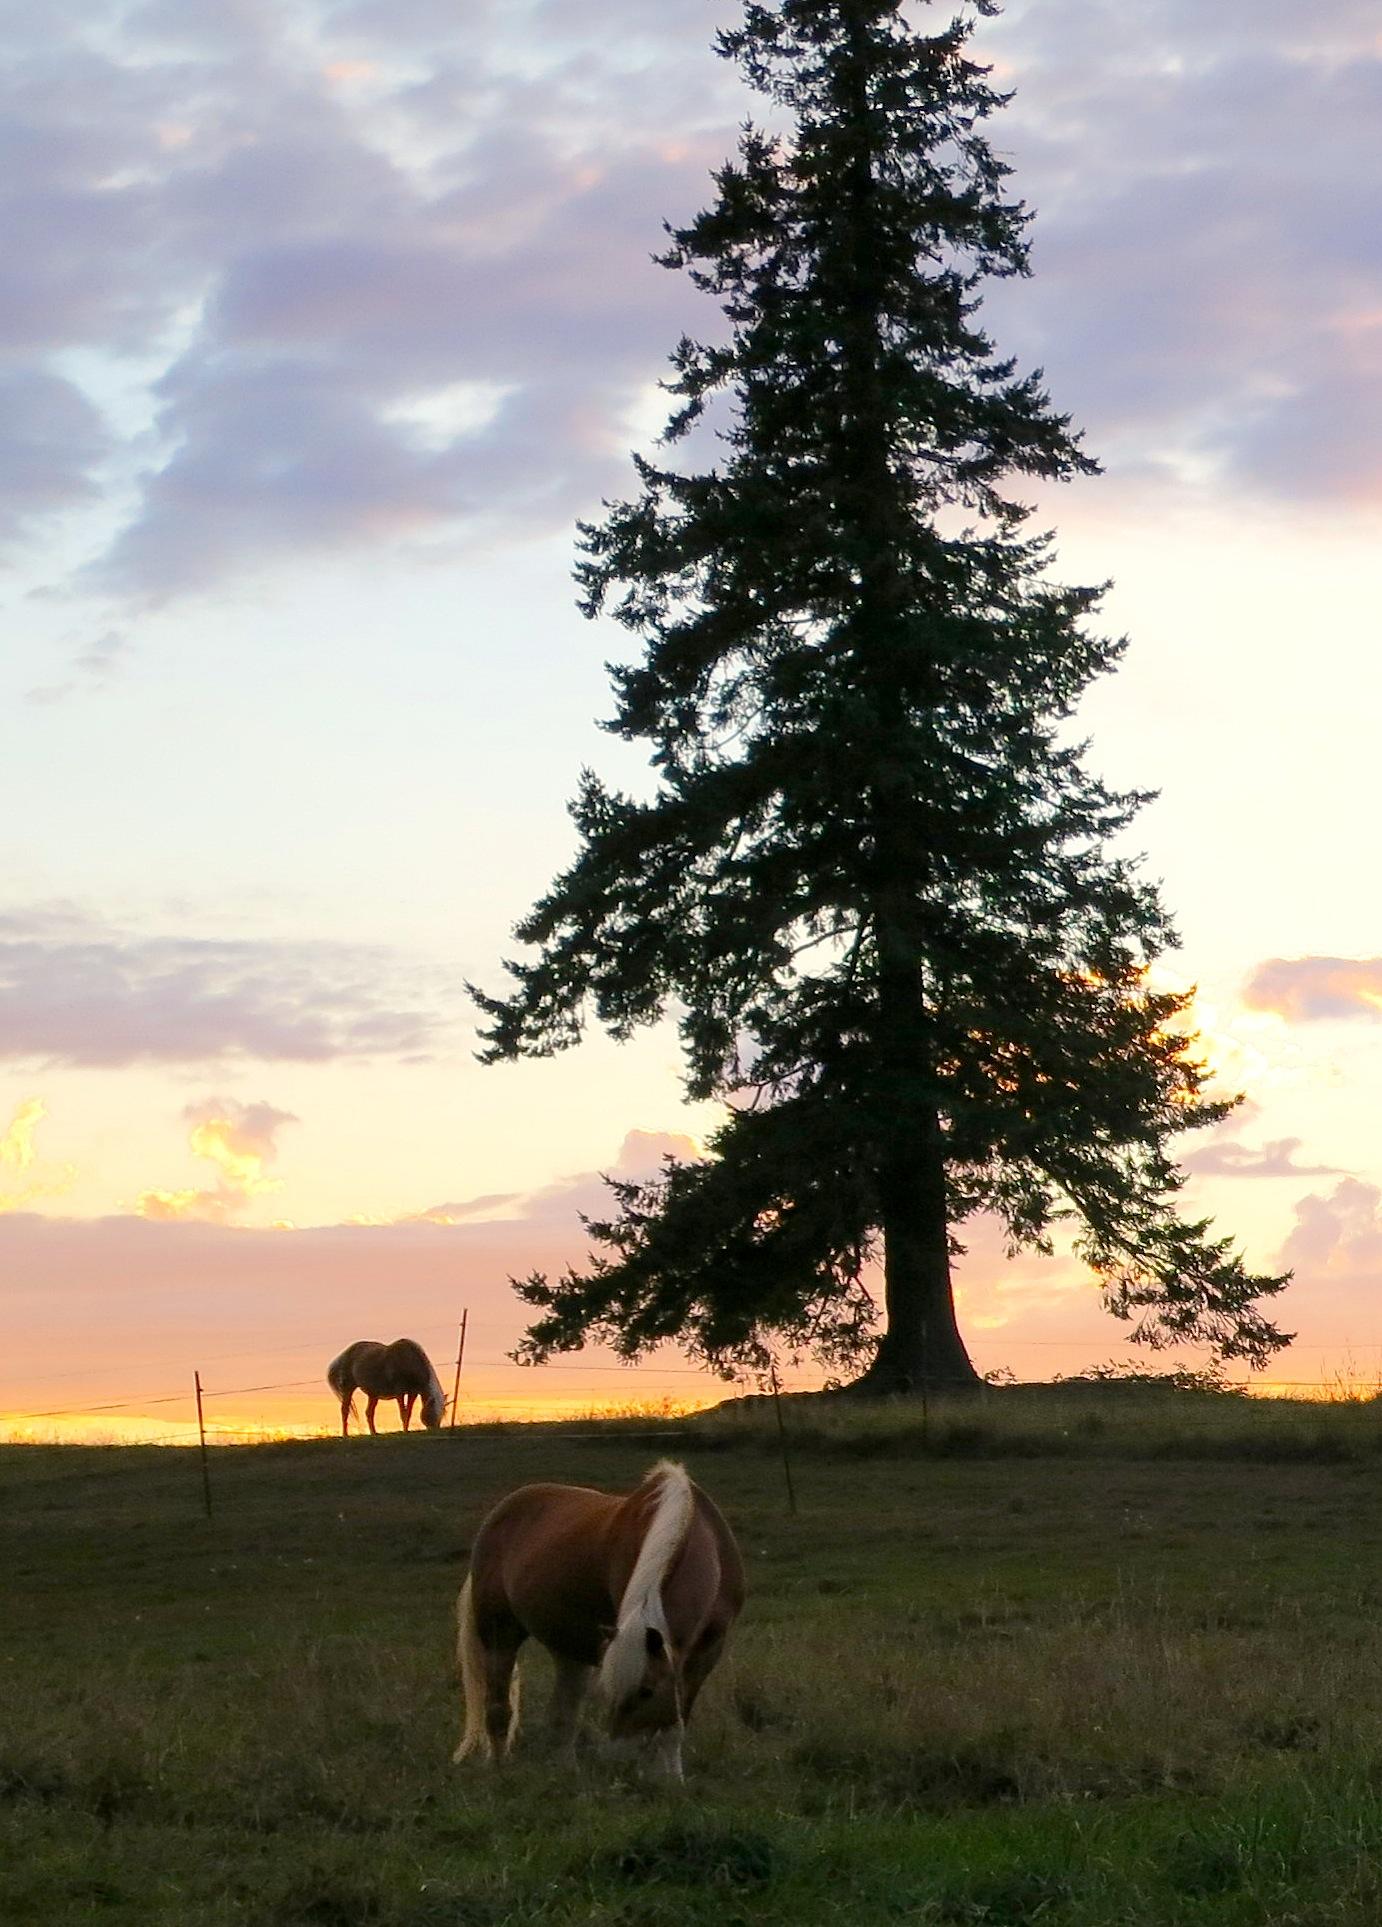 sunset92horses2